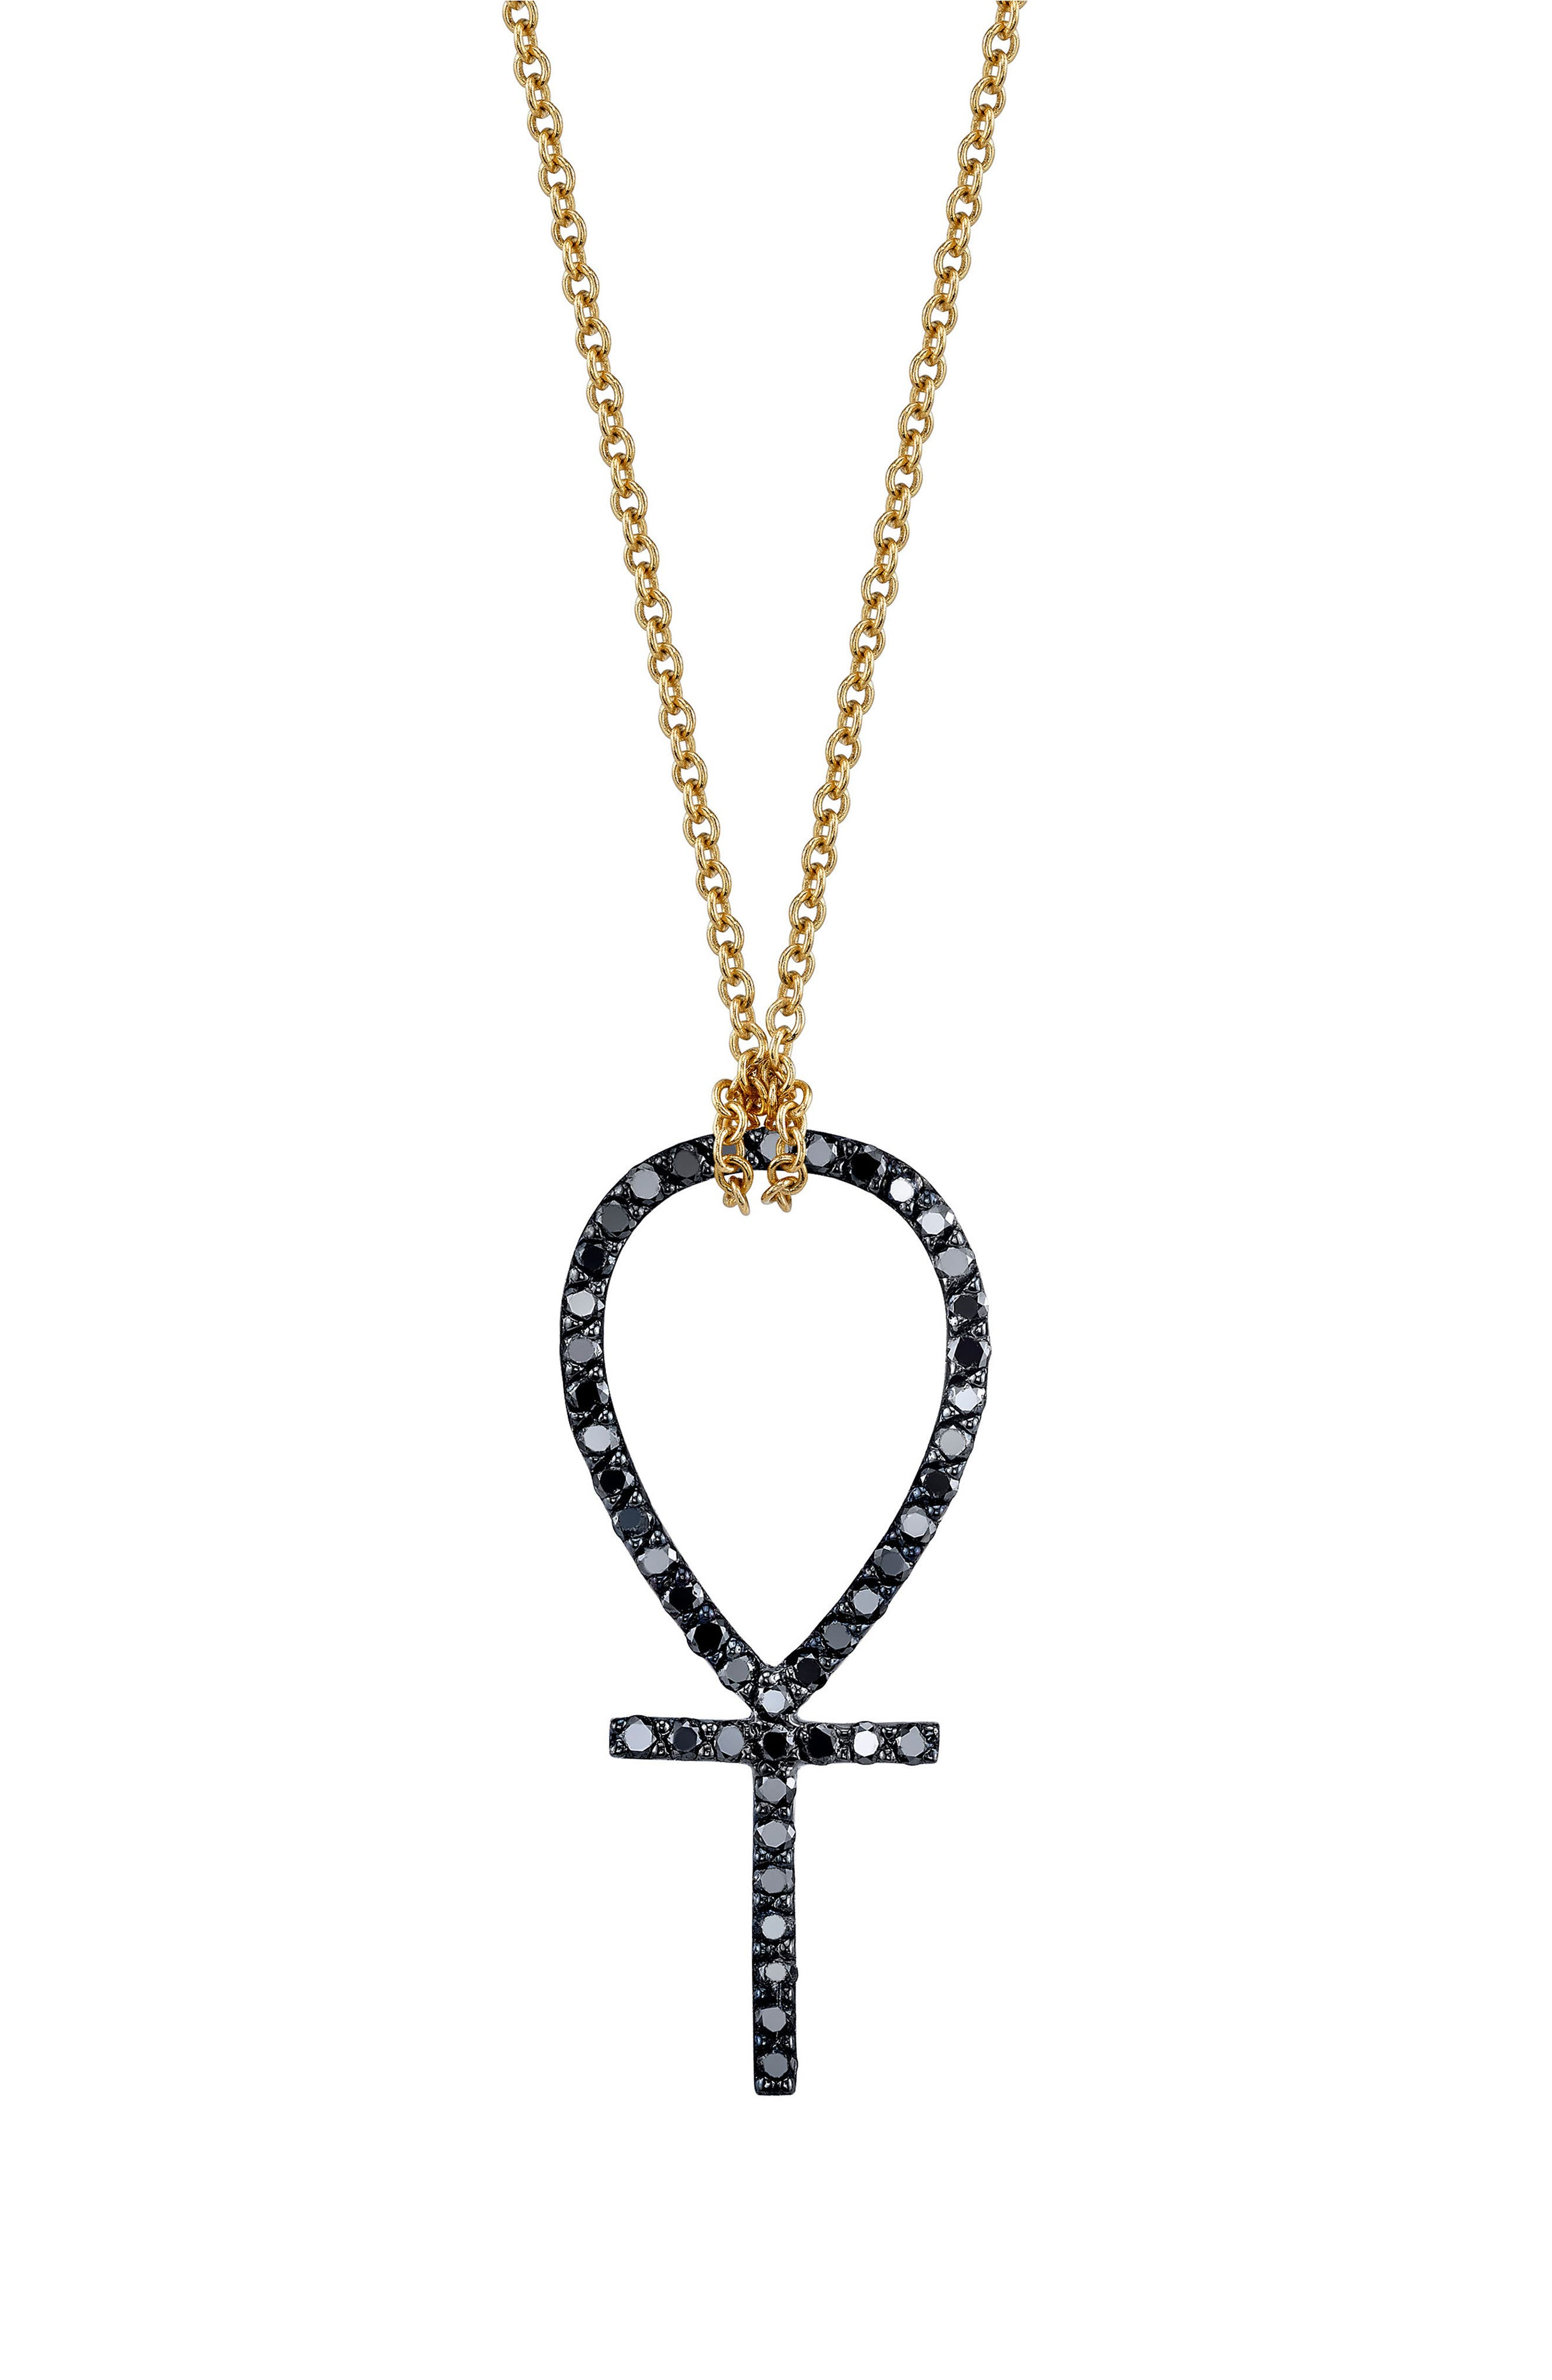 x Rashida Jones Black Diamond Ankh Pendant Necklace,                             Main thumbnail 1, color,                             Yellow Gold